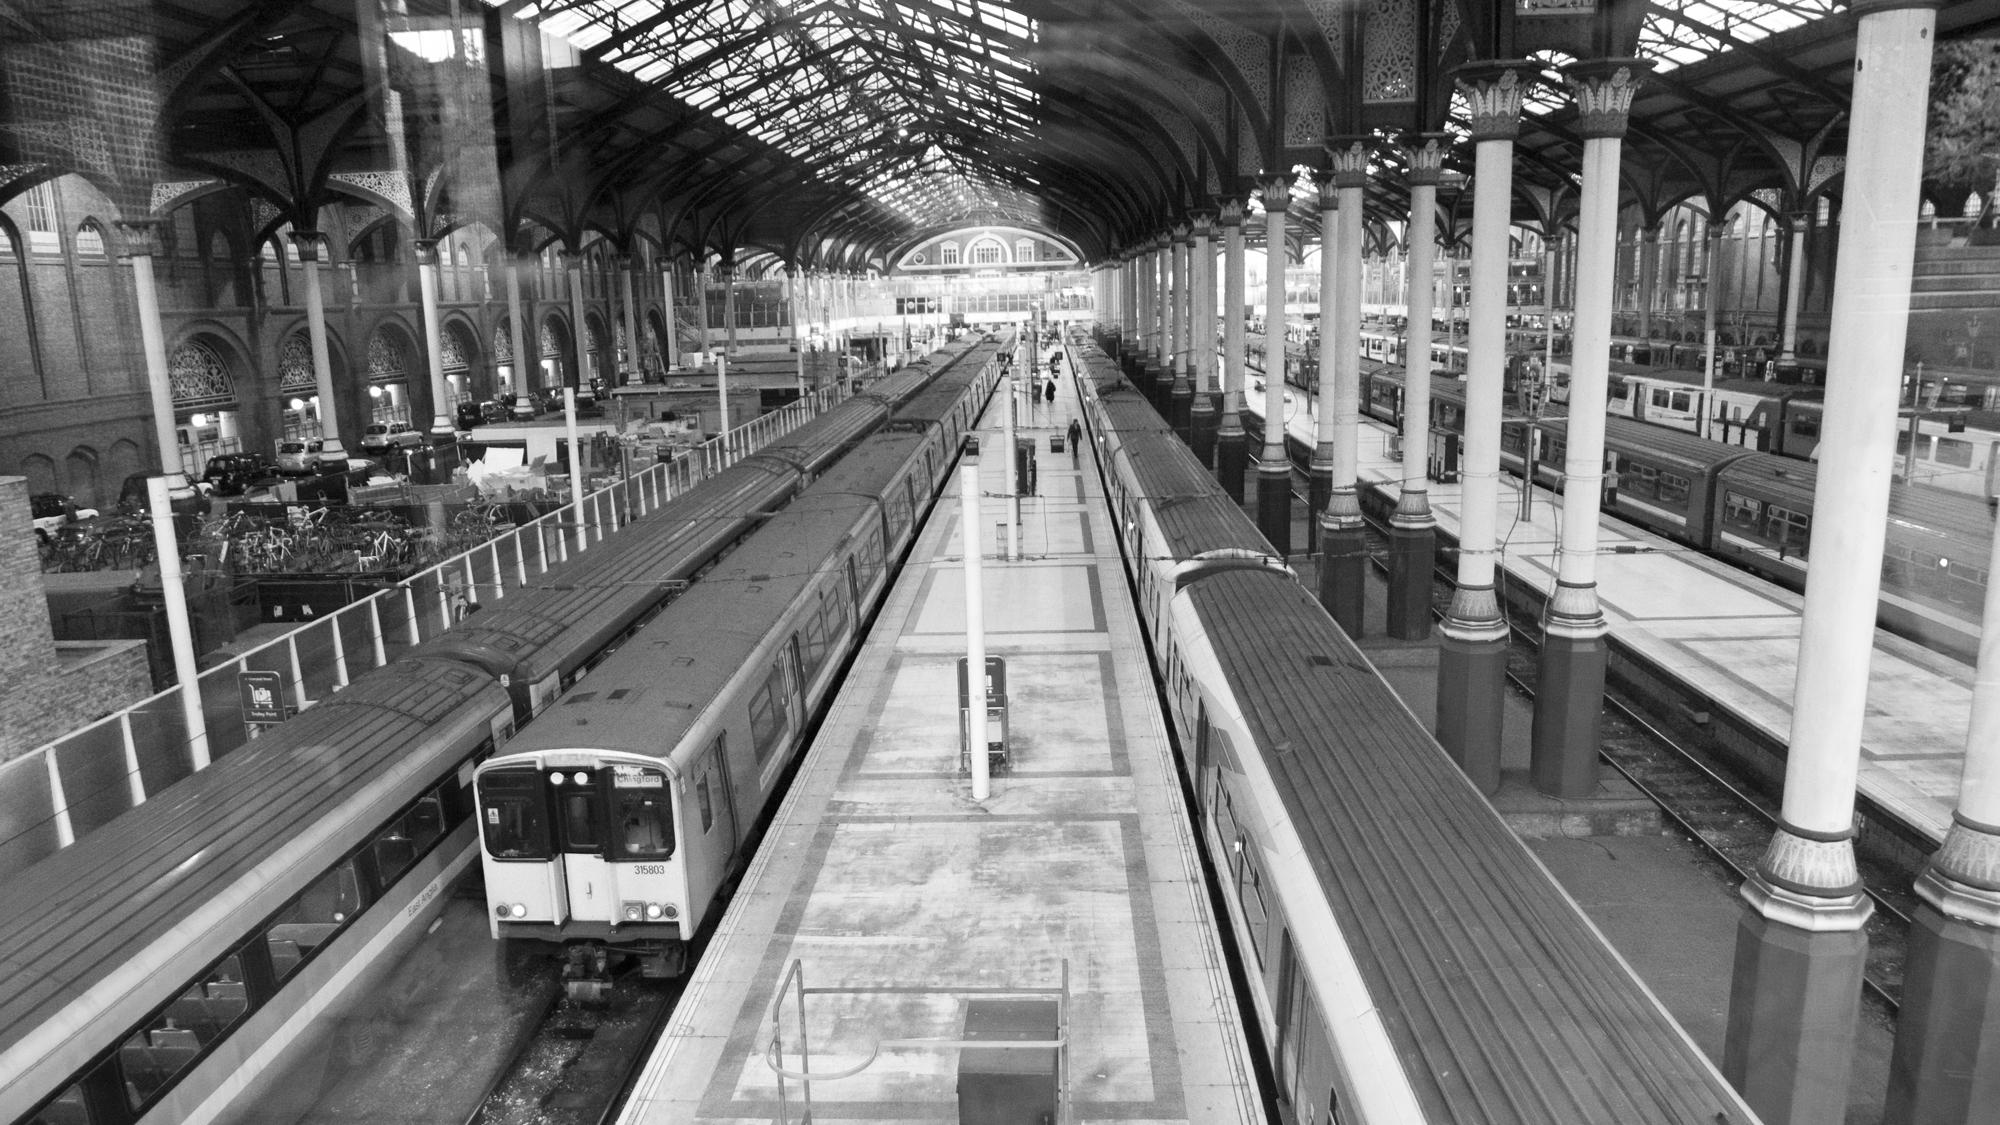 liverpoolst_station_trains.jpg